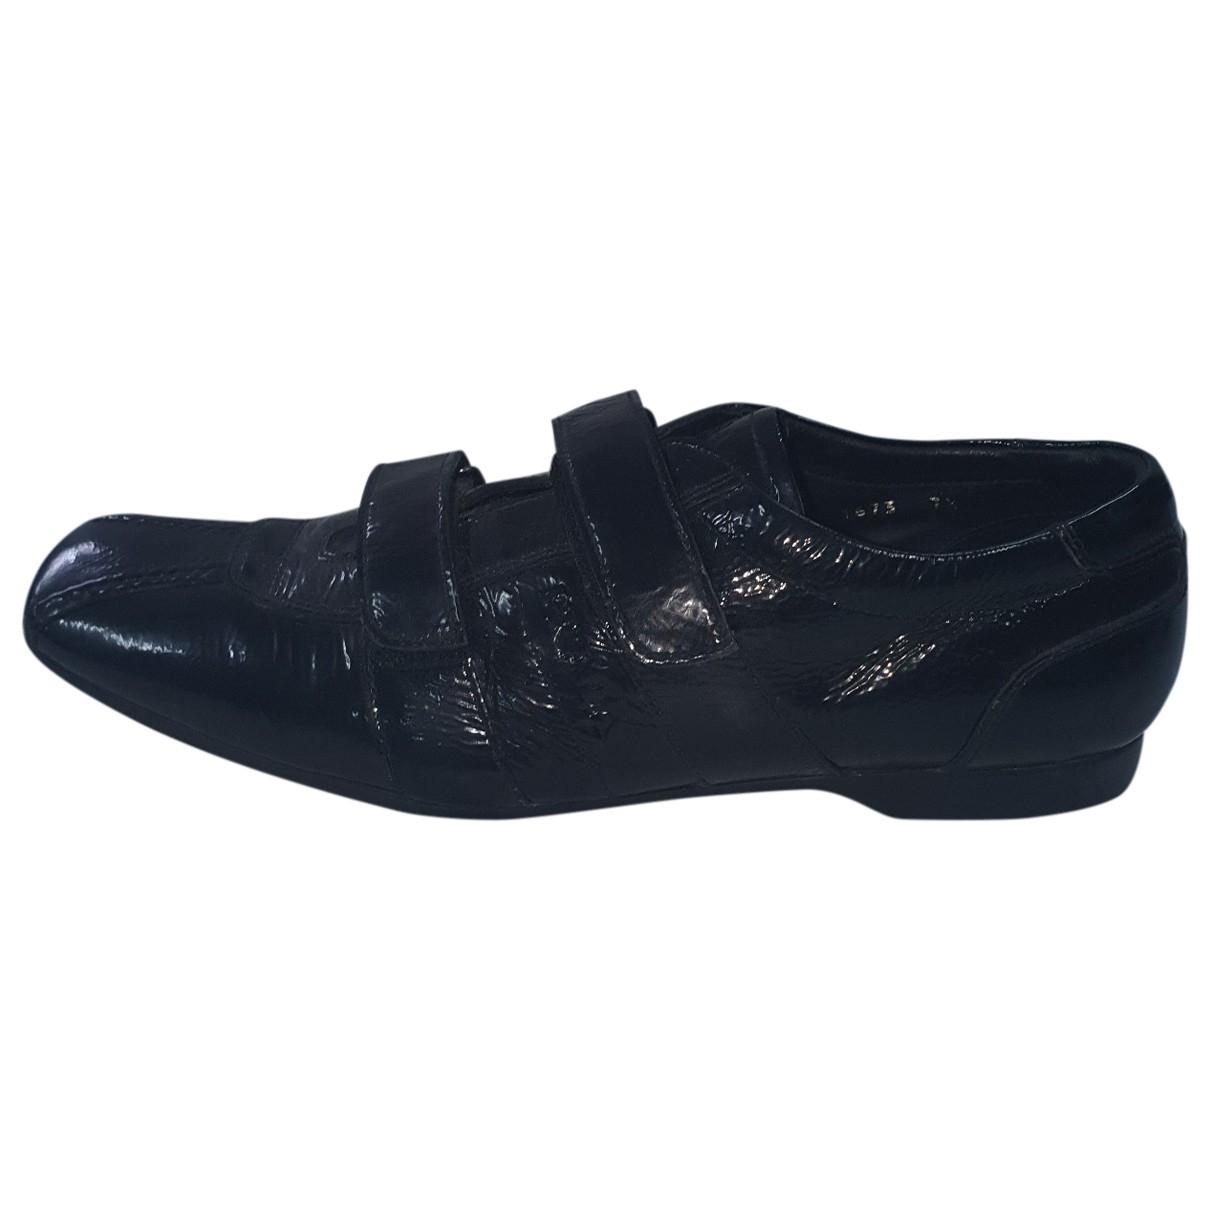 Prada \N Black Patent leather Lace ups for Men 7.5 UK